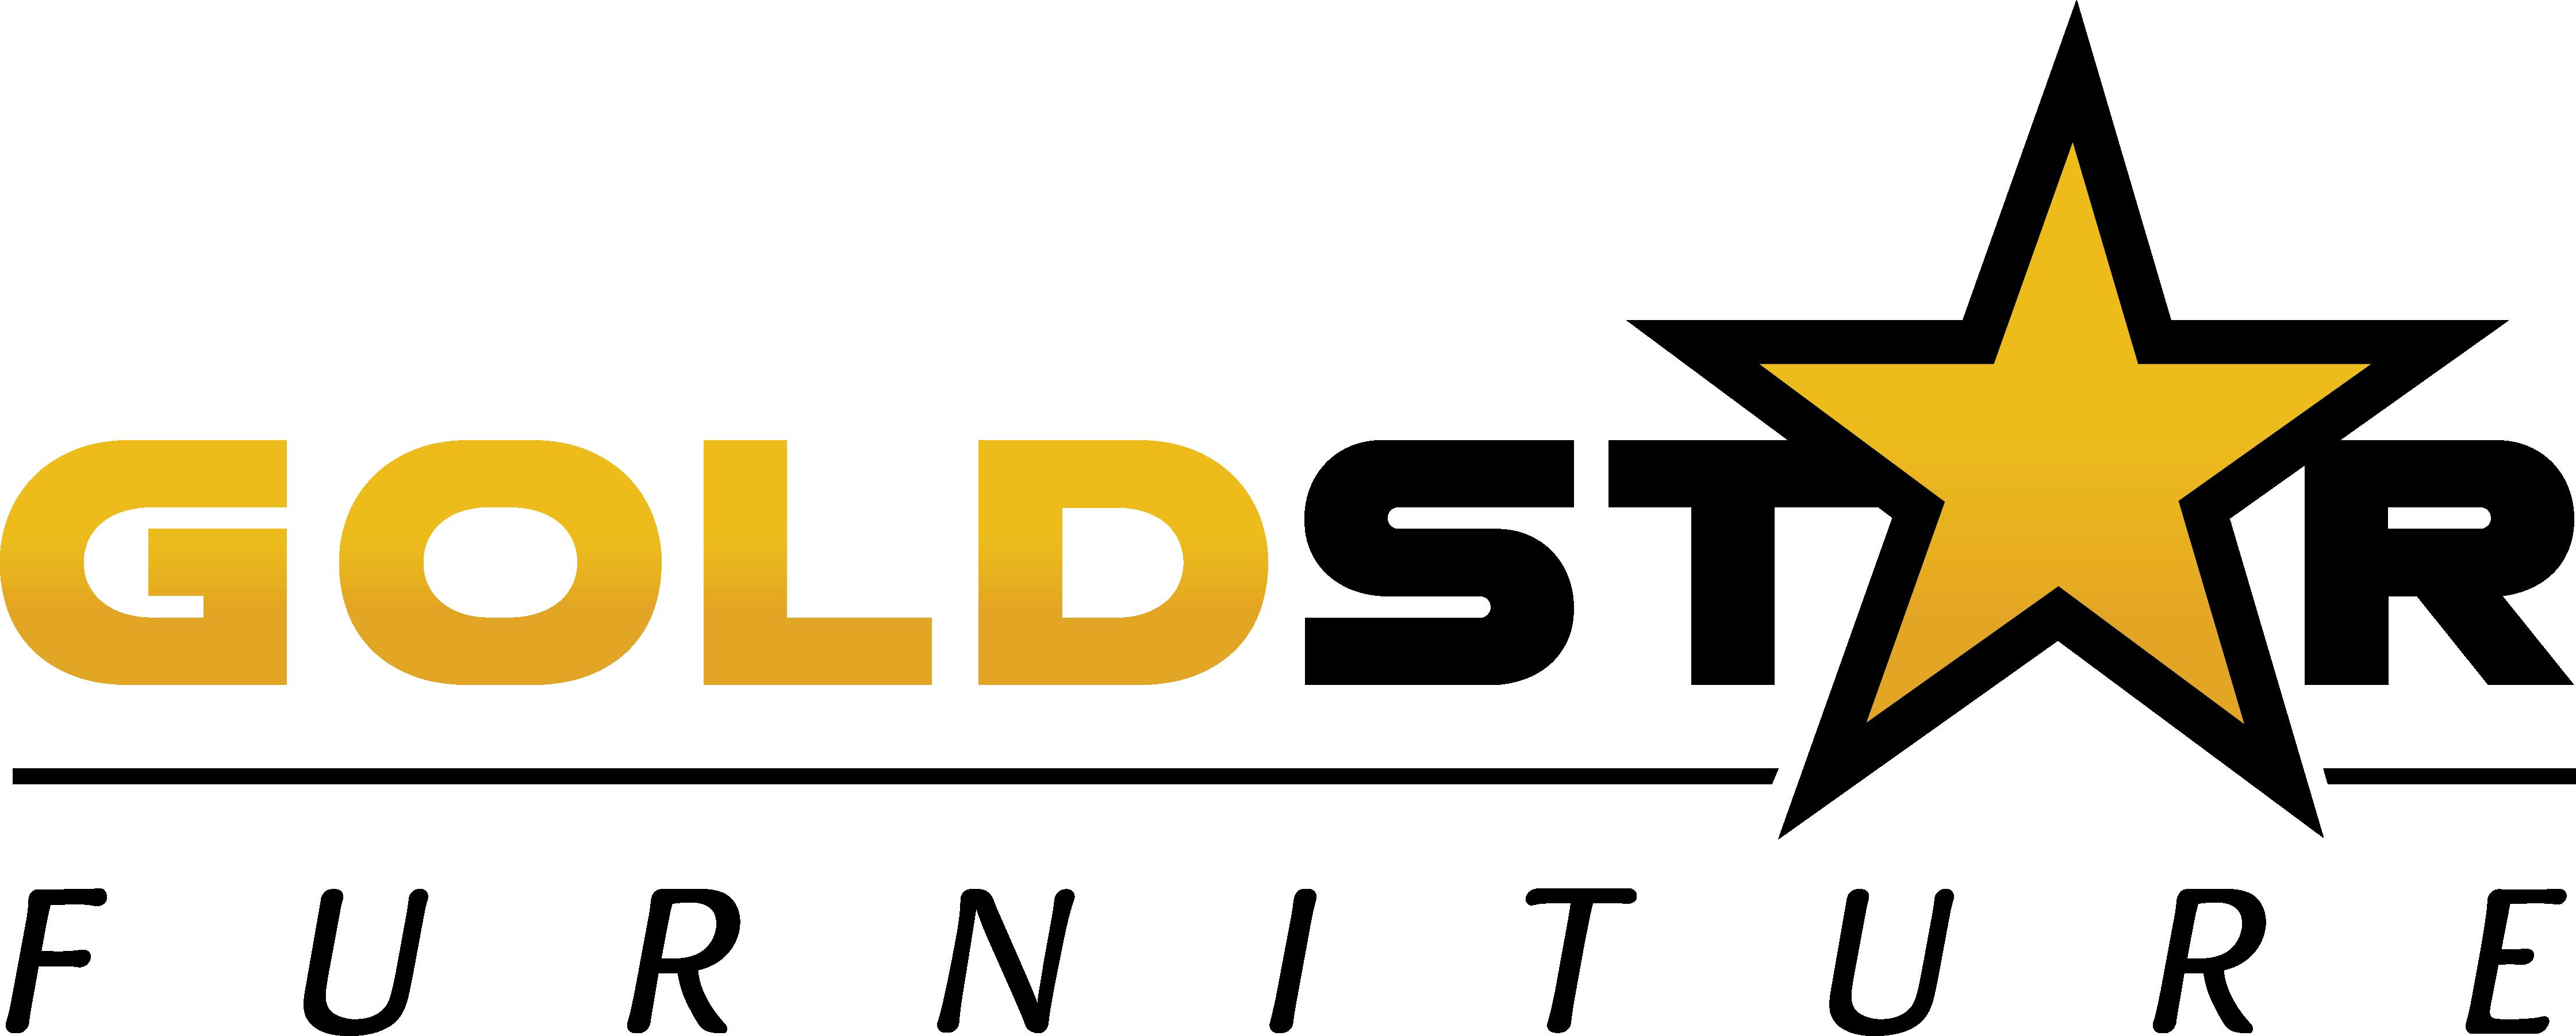 Furniture clipart furniture logo. Goldstar sephoco